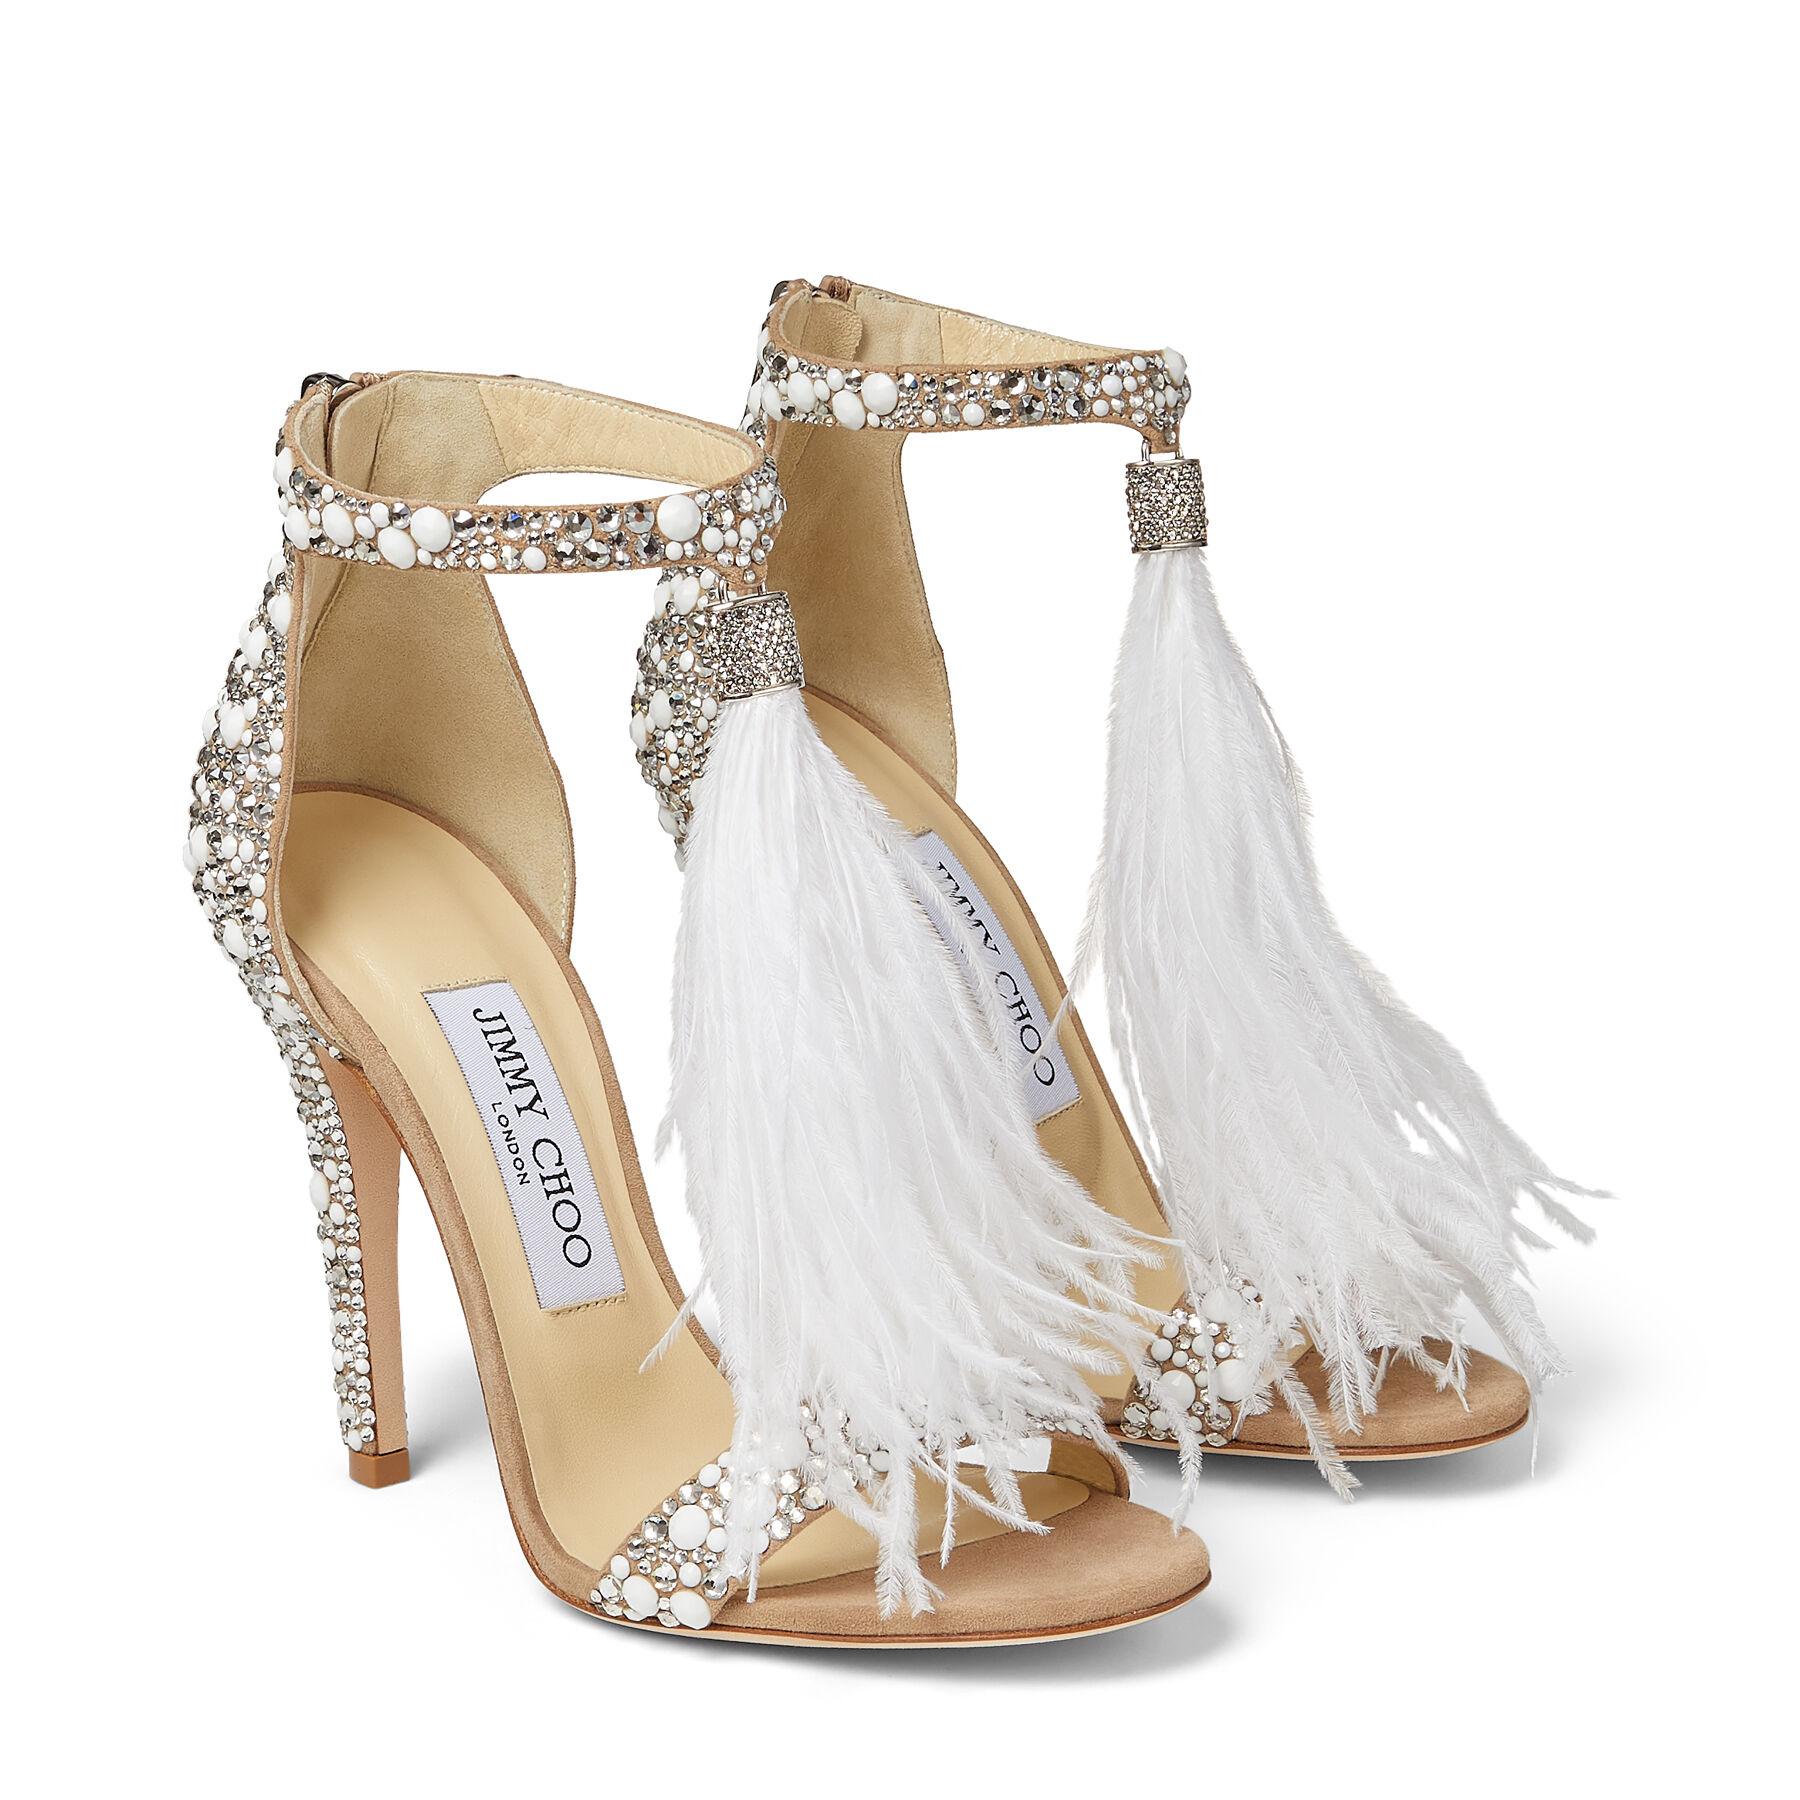 Jimmy Choo Wedding Shoes | Dress for